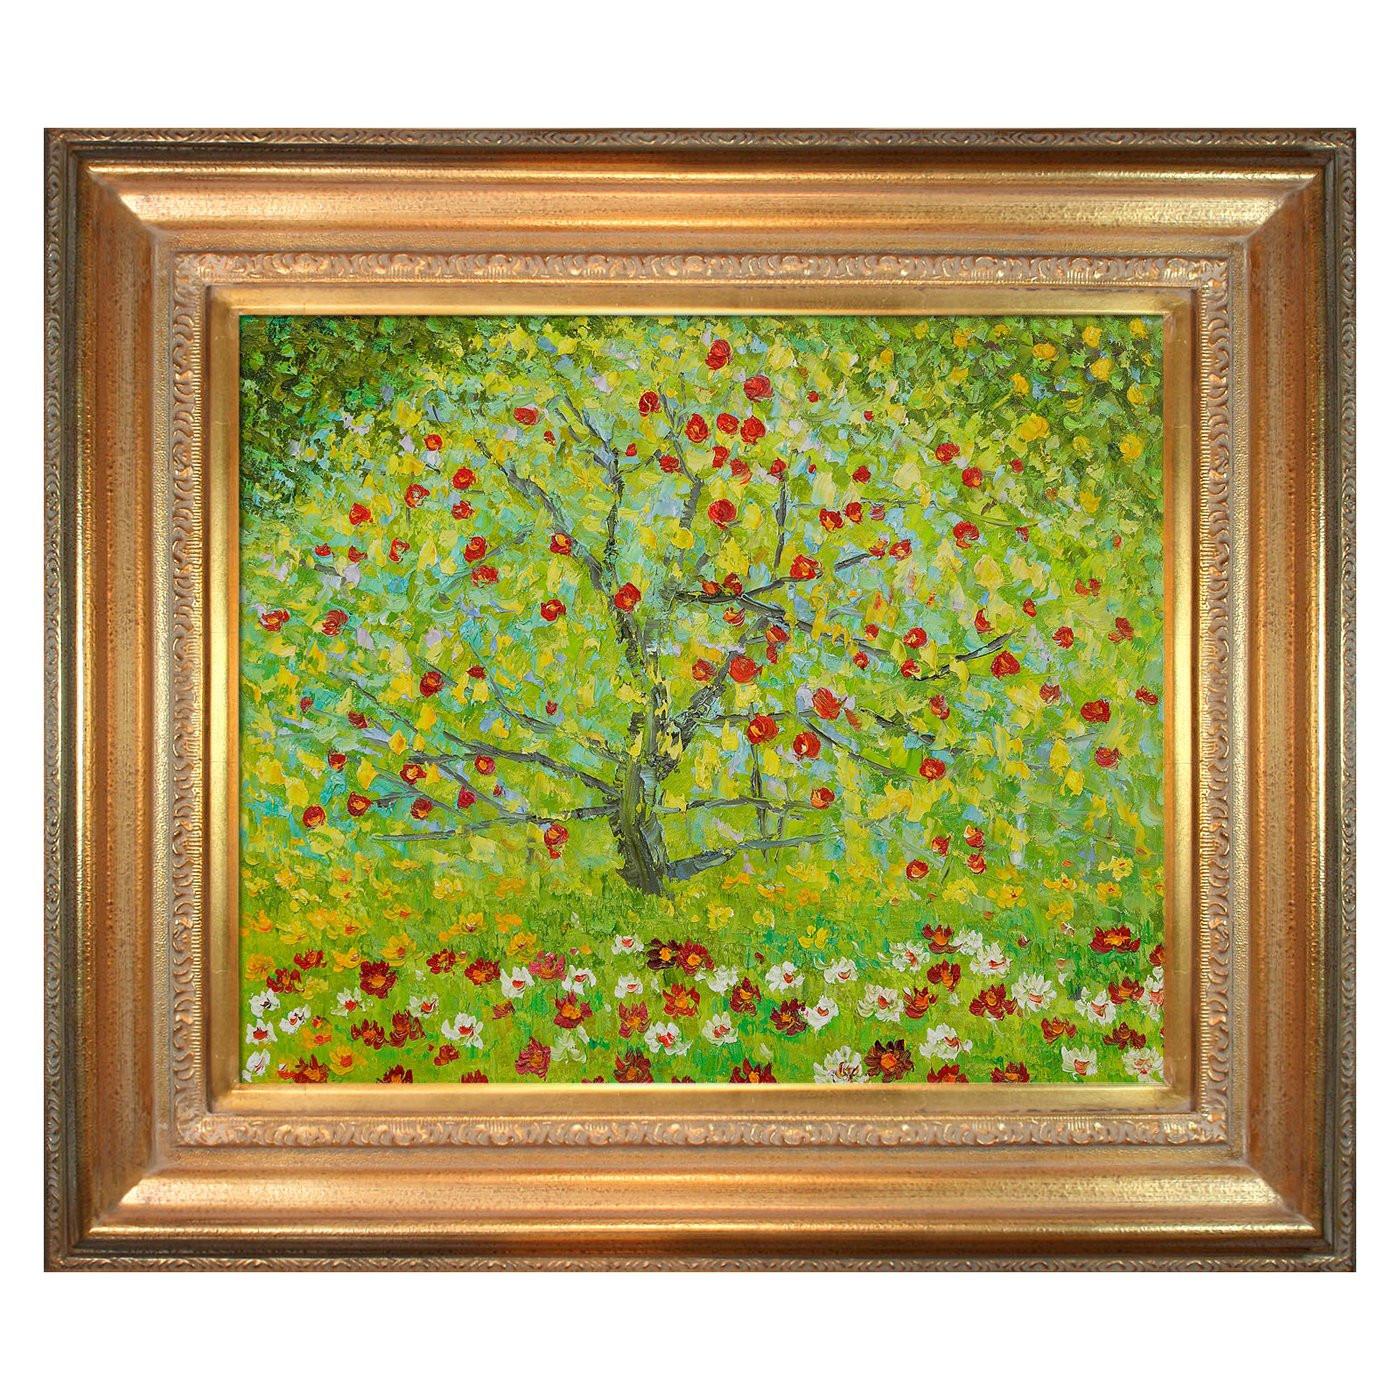 Best ideas about Overstock Wall Art . Save or Pin Overstock Art KL2477 FR 446G20X24 Gustav Klimt The Apple Now.